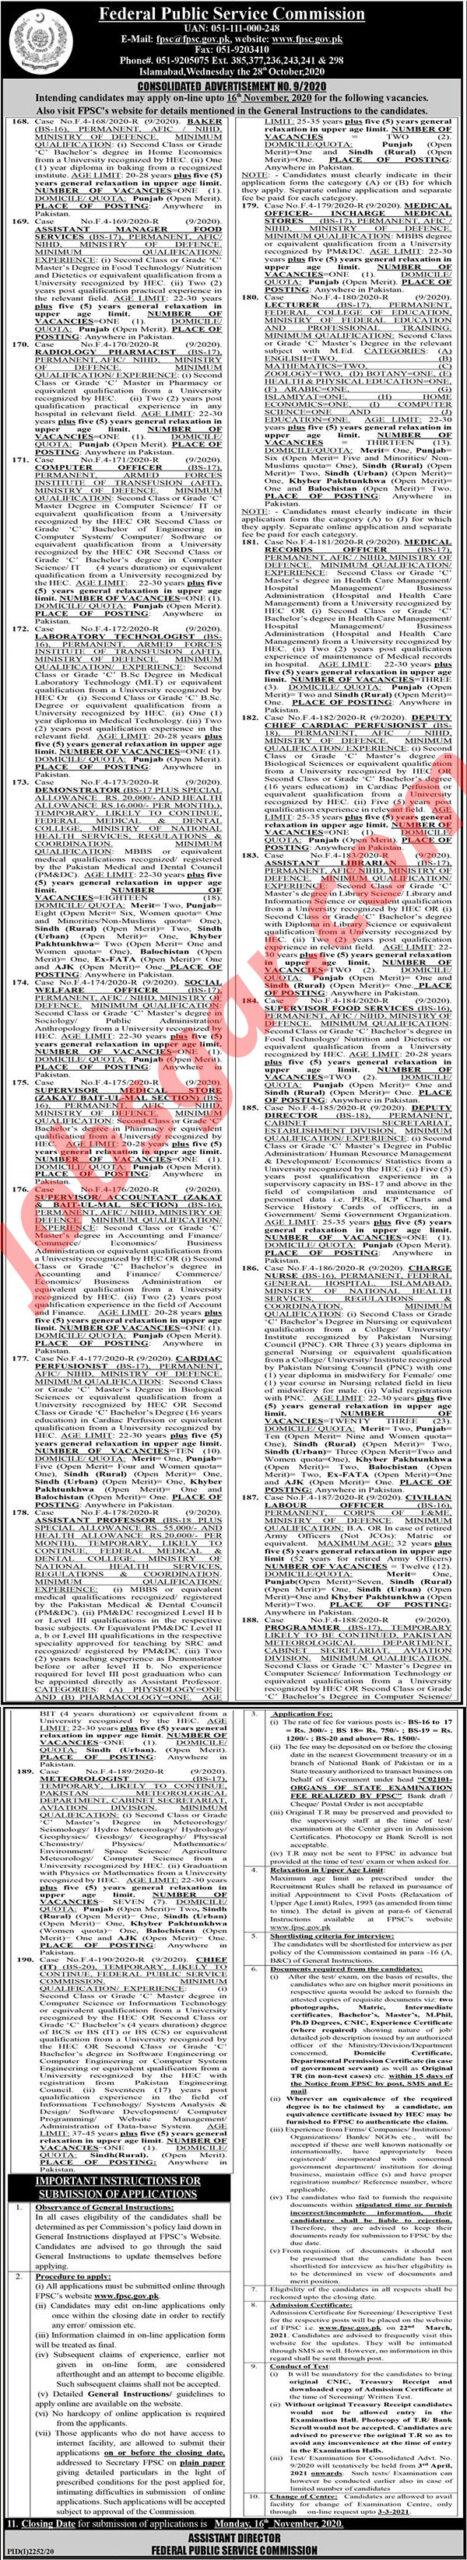 FPSC Jobs Advertisement No 9 2020 Federal Public Service Commission